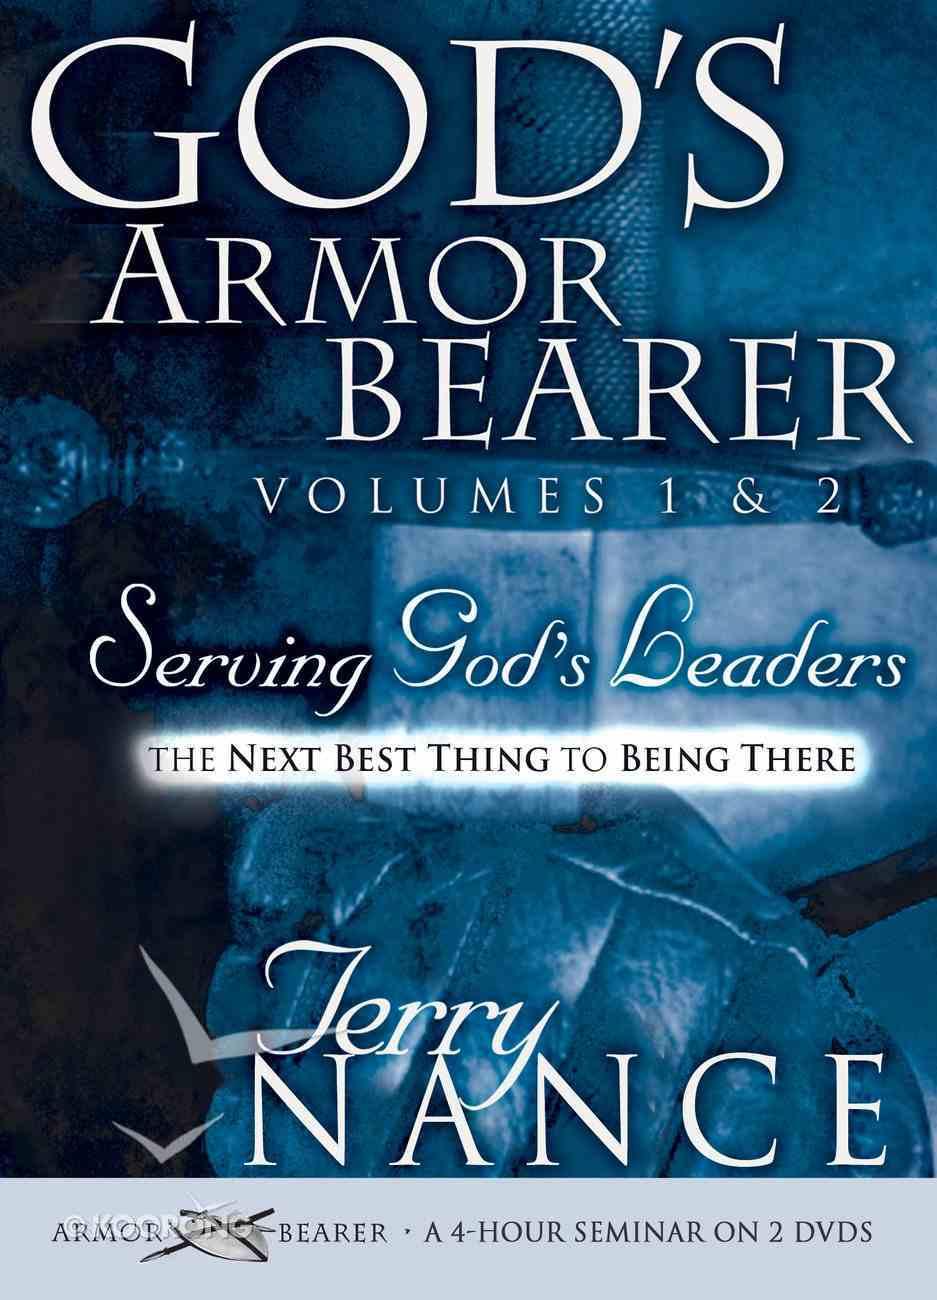 God's Armorbearer (Volumes 1 & 2) DVD